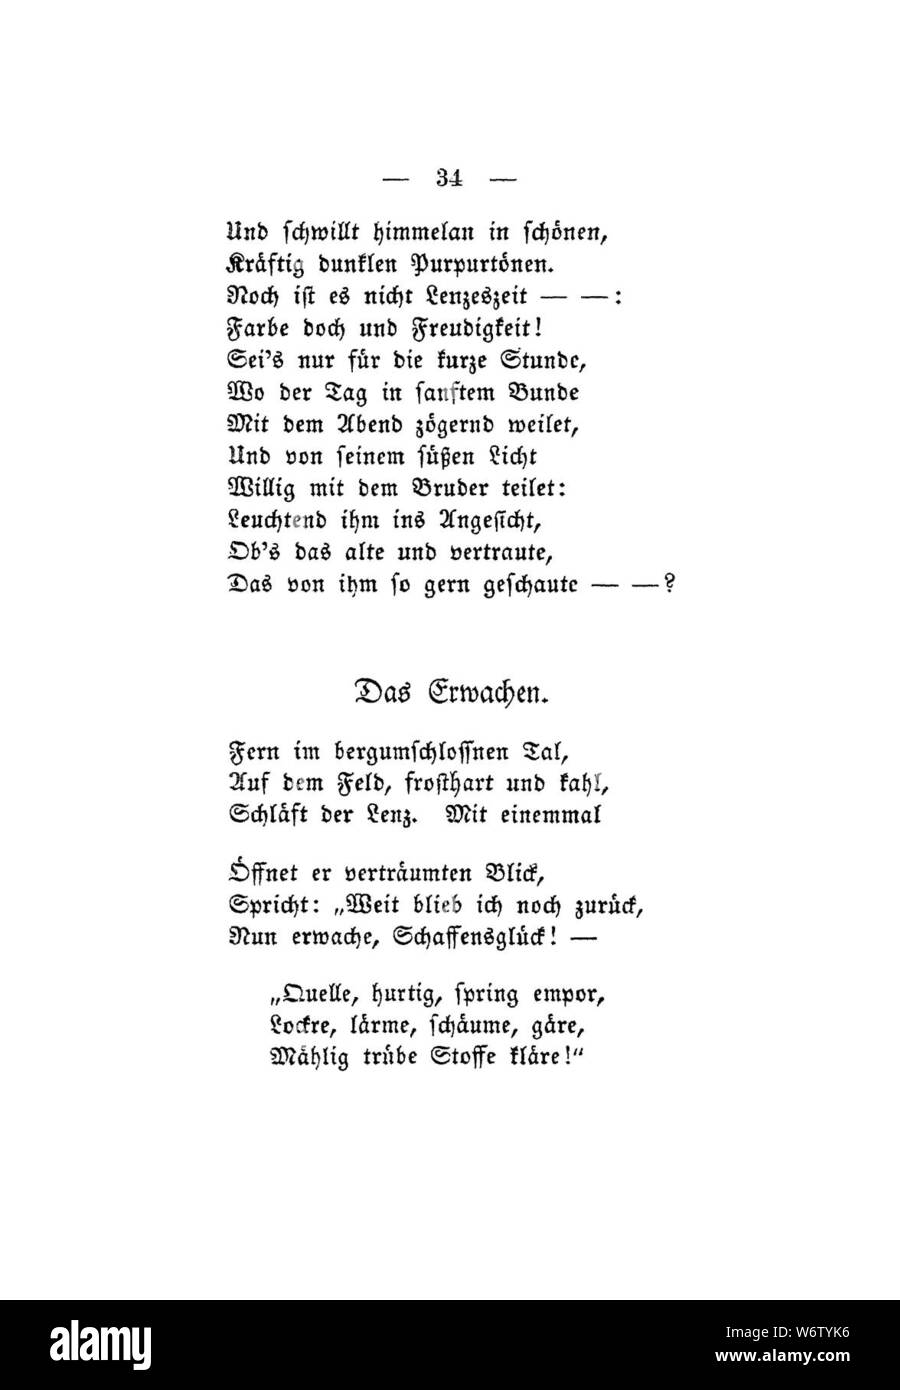 De Gedichte Woerner U C 035 Stock Photo 262392010 Alamy